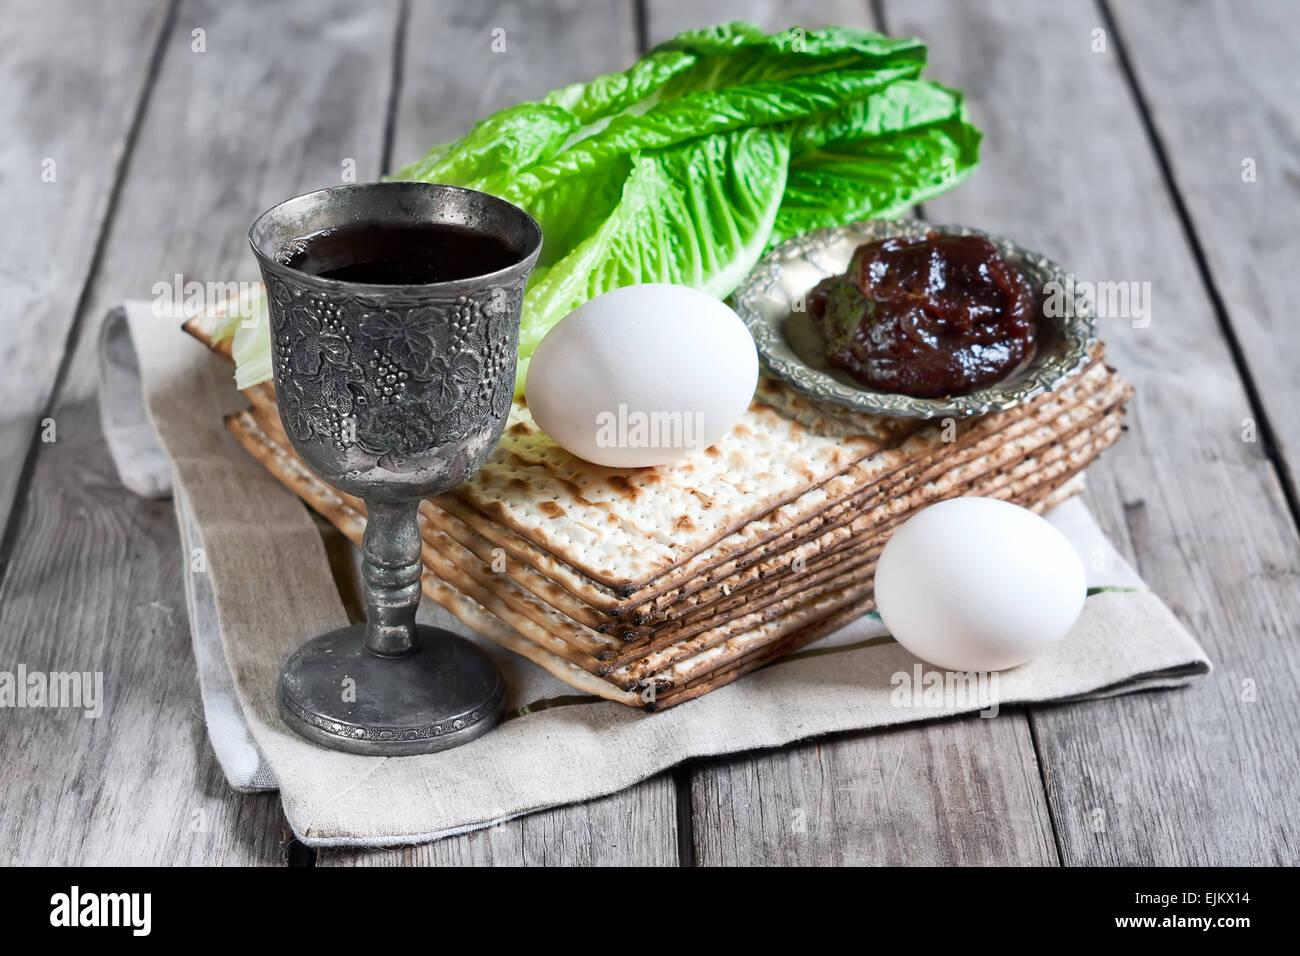 Wine, egg, bitter salad leaves, matzot and haroset - traditional jewish passover celebration elements. - Stock Image